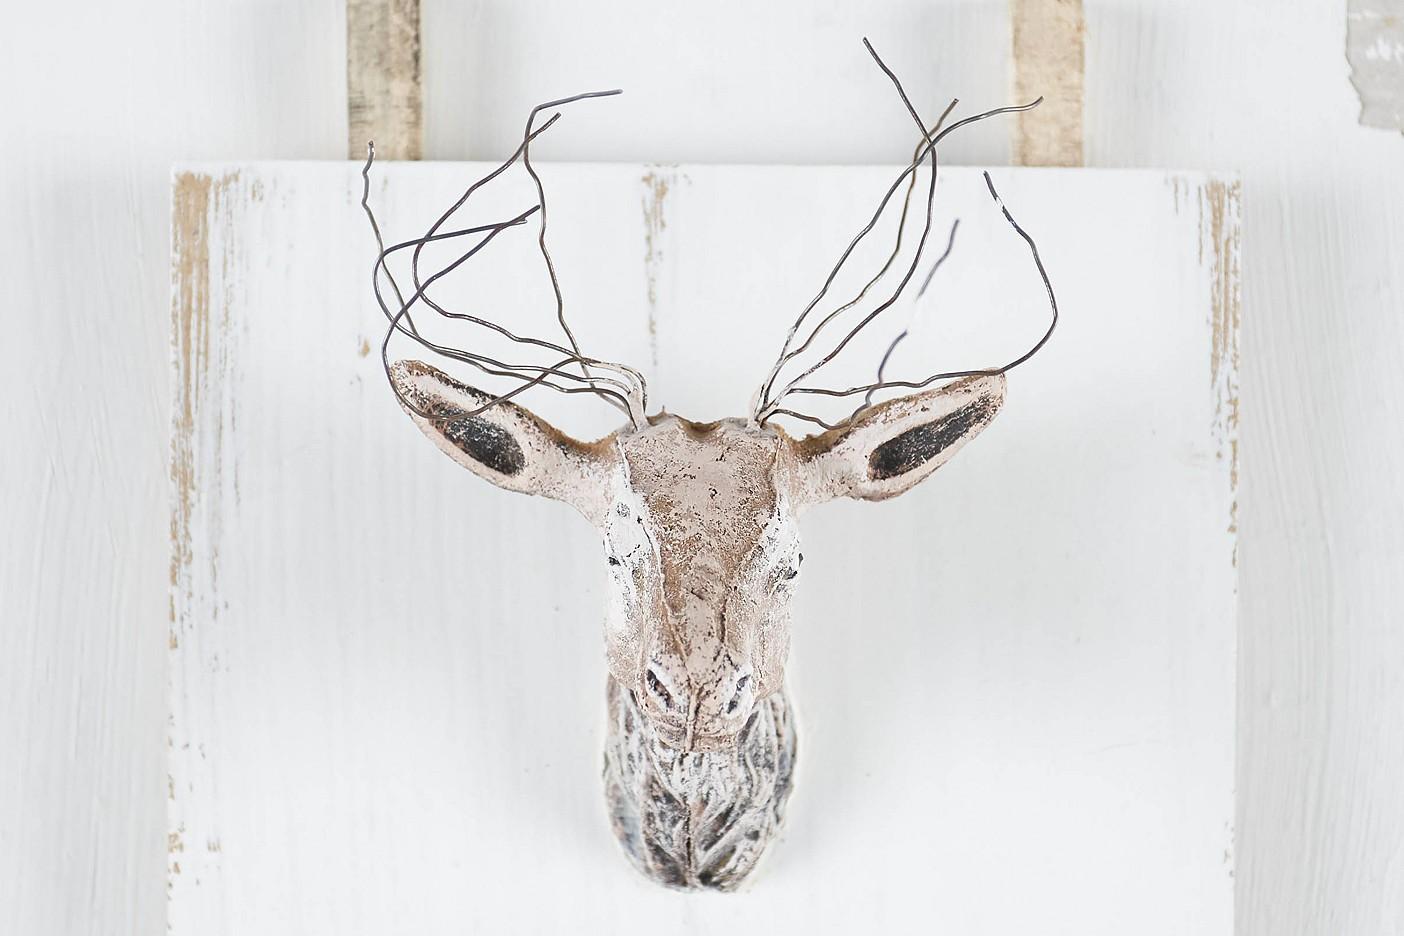 Hirschobjekt